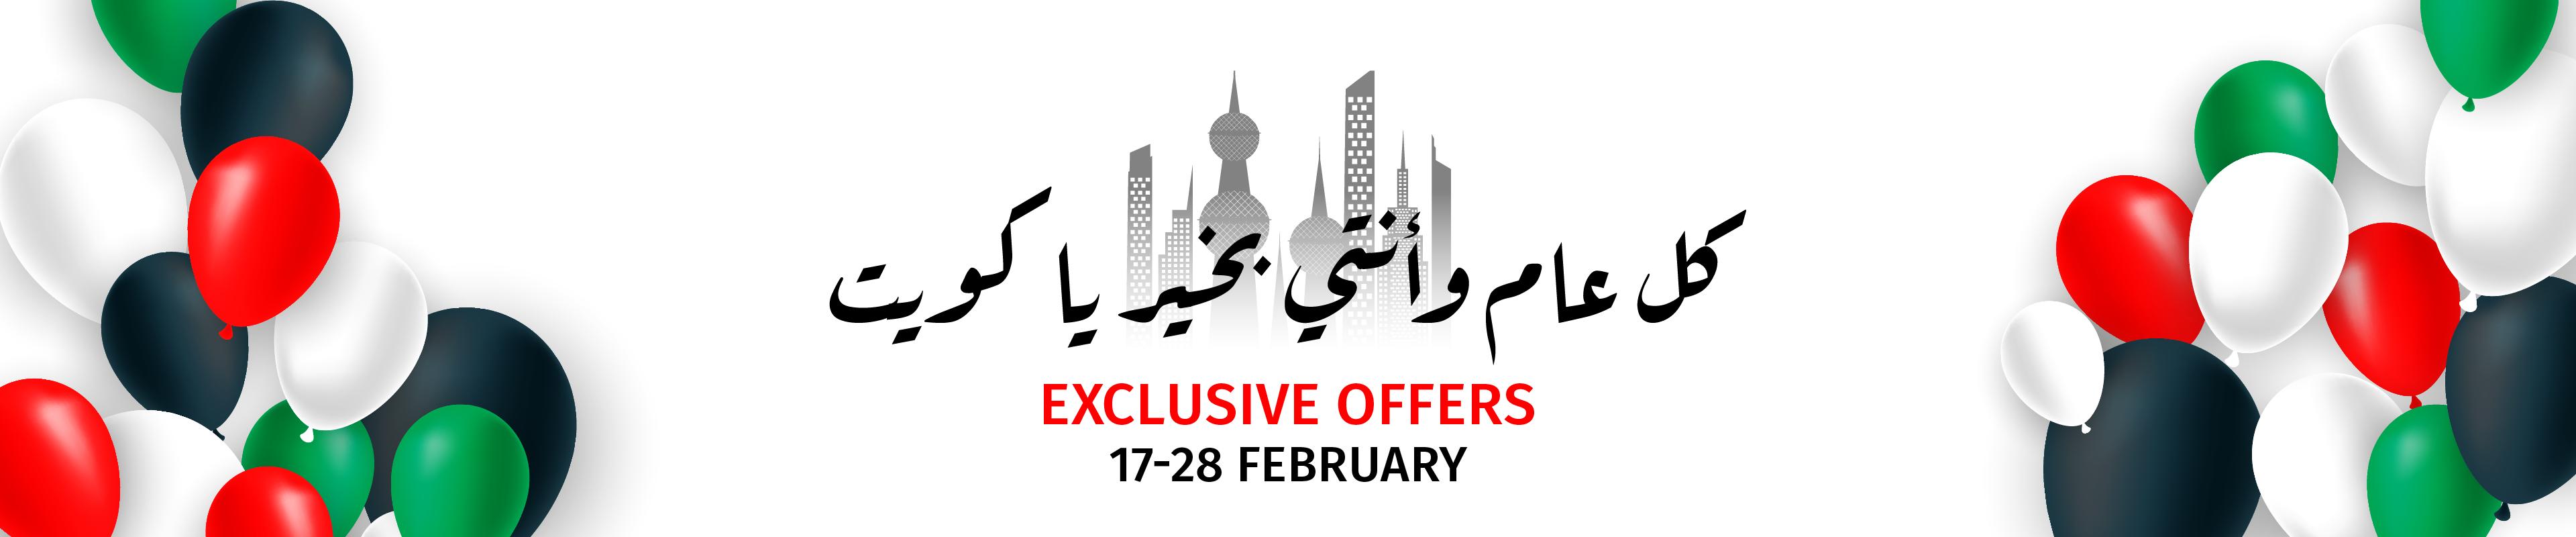 Hala Feb offers